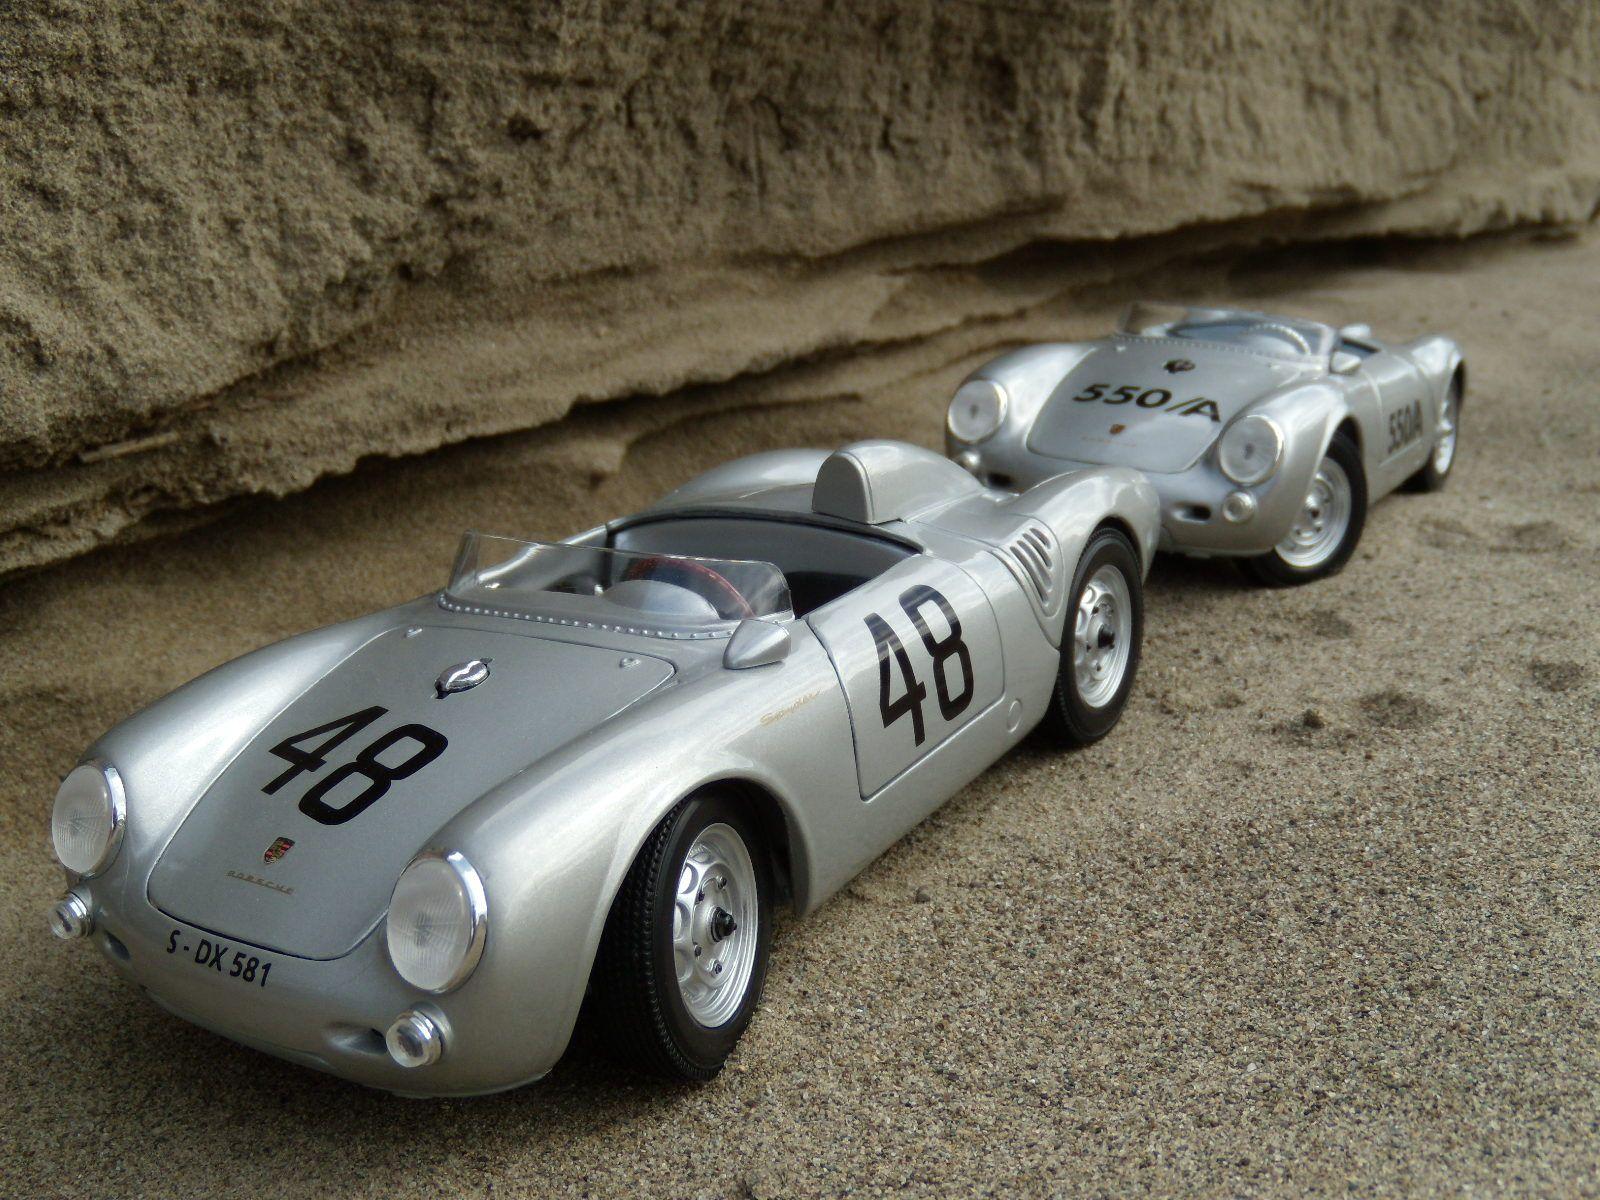 63826ec132907bae776ad7c455336753 Outstanding Maisto Porsche 911 Gt1 Le Mans 1998 Cars Trend